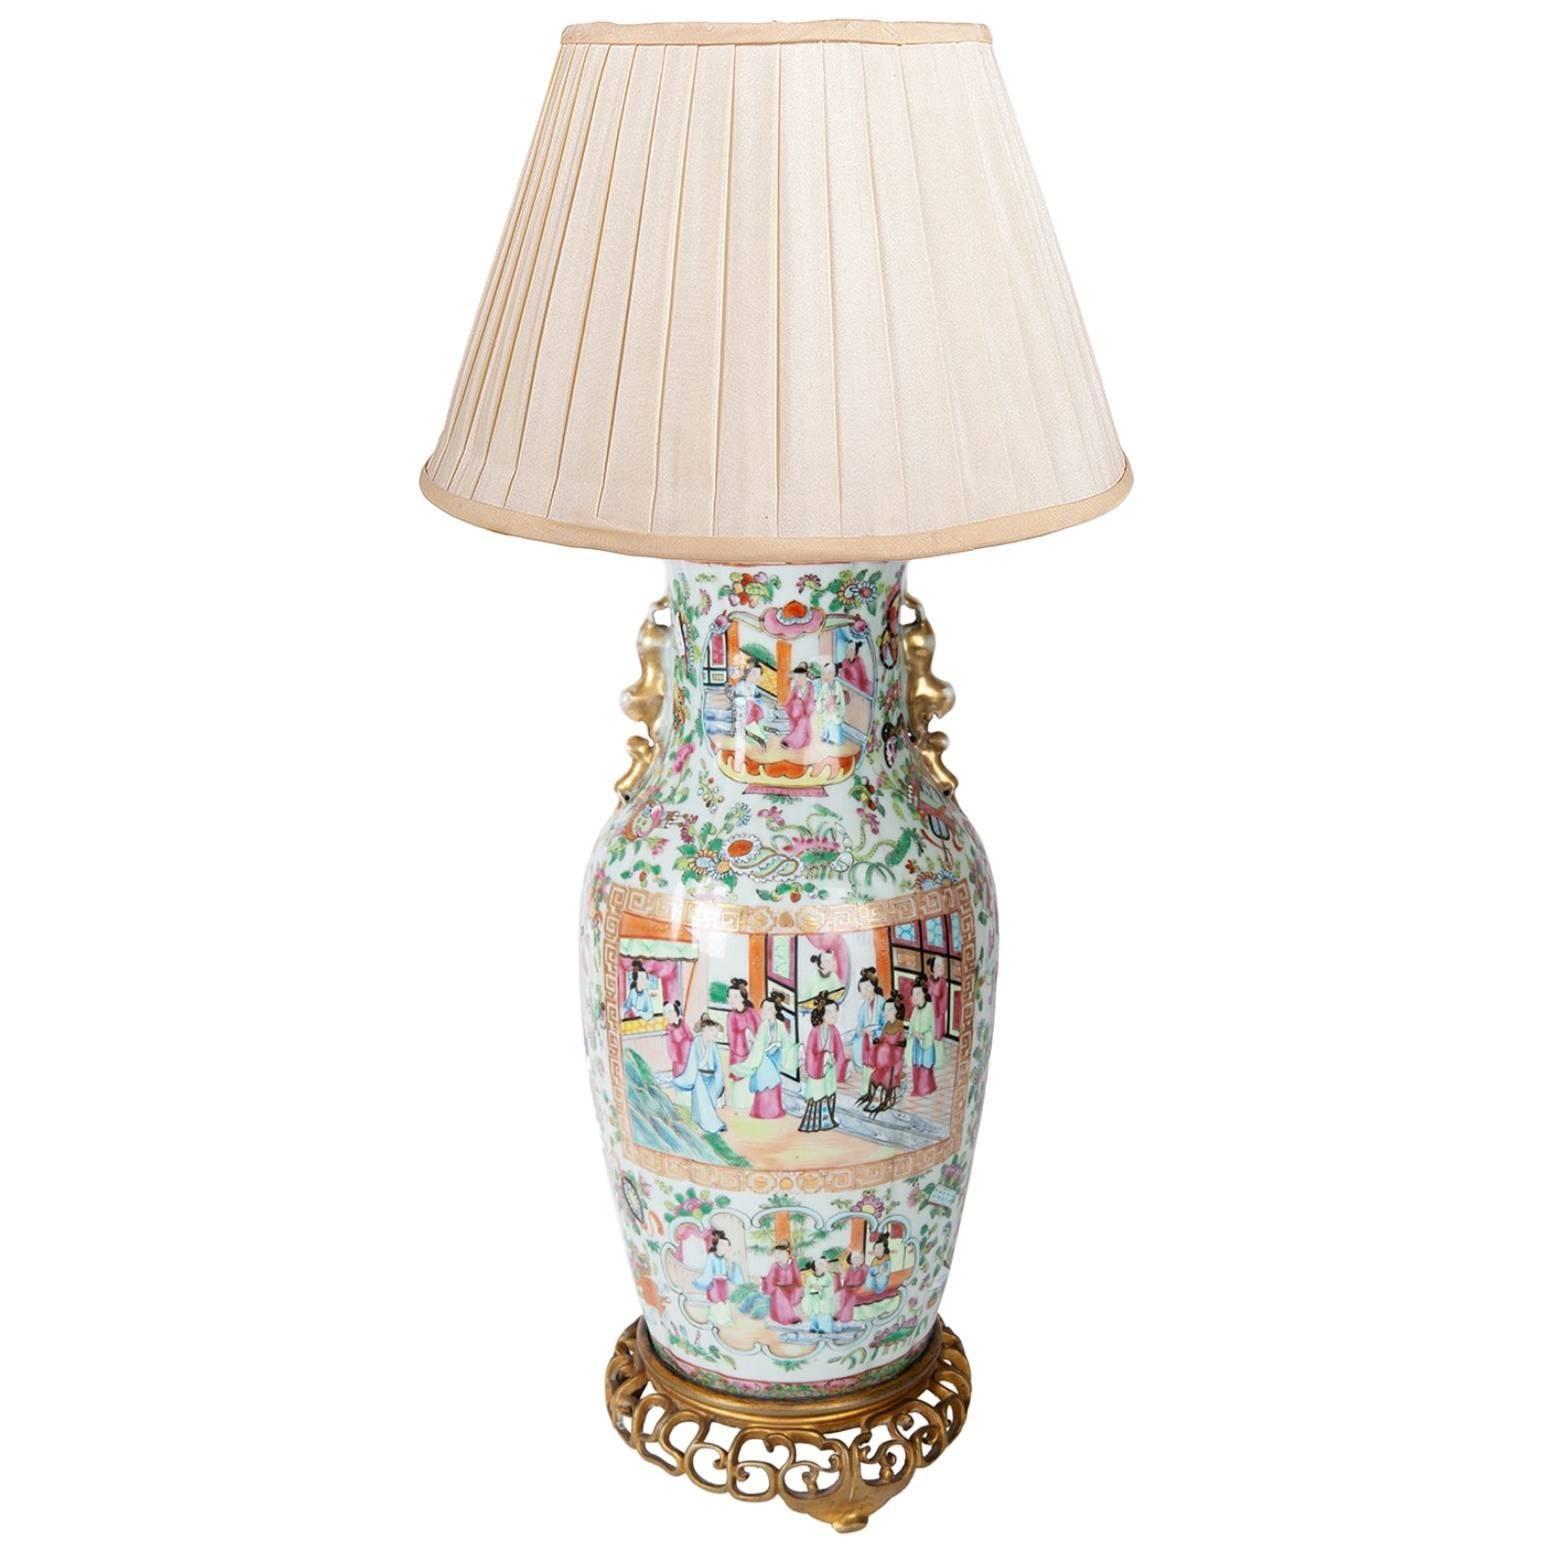 19th Century Rose Medallion Vase / Lamp